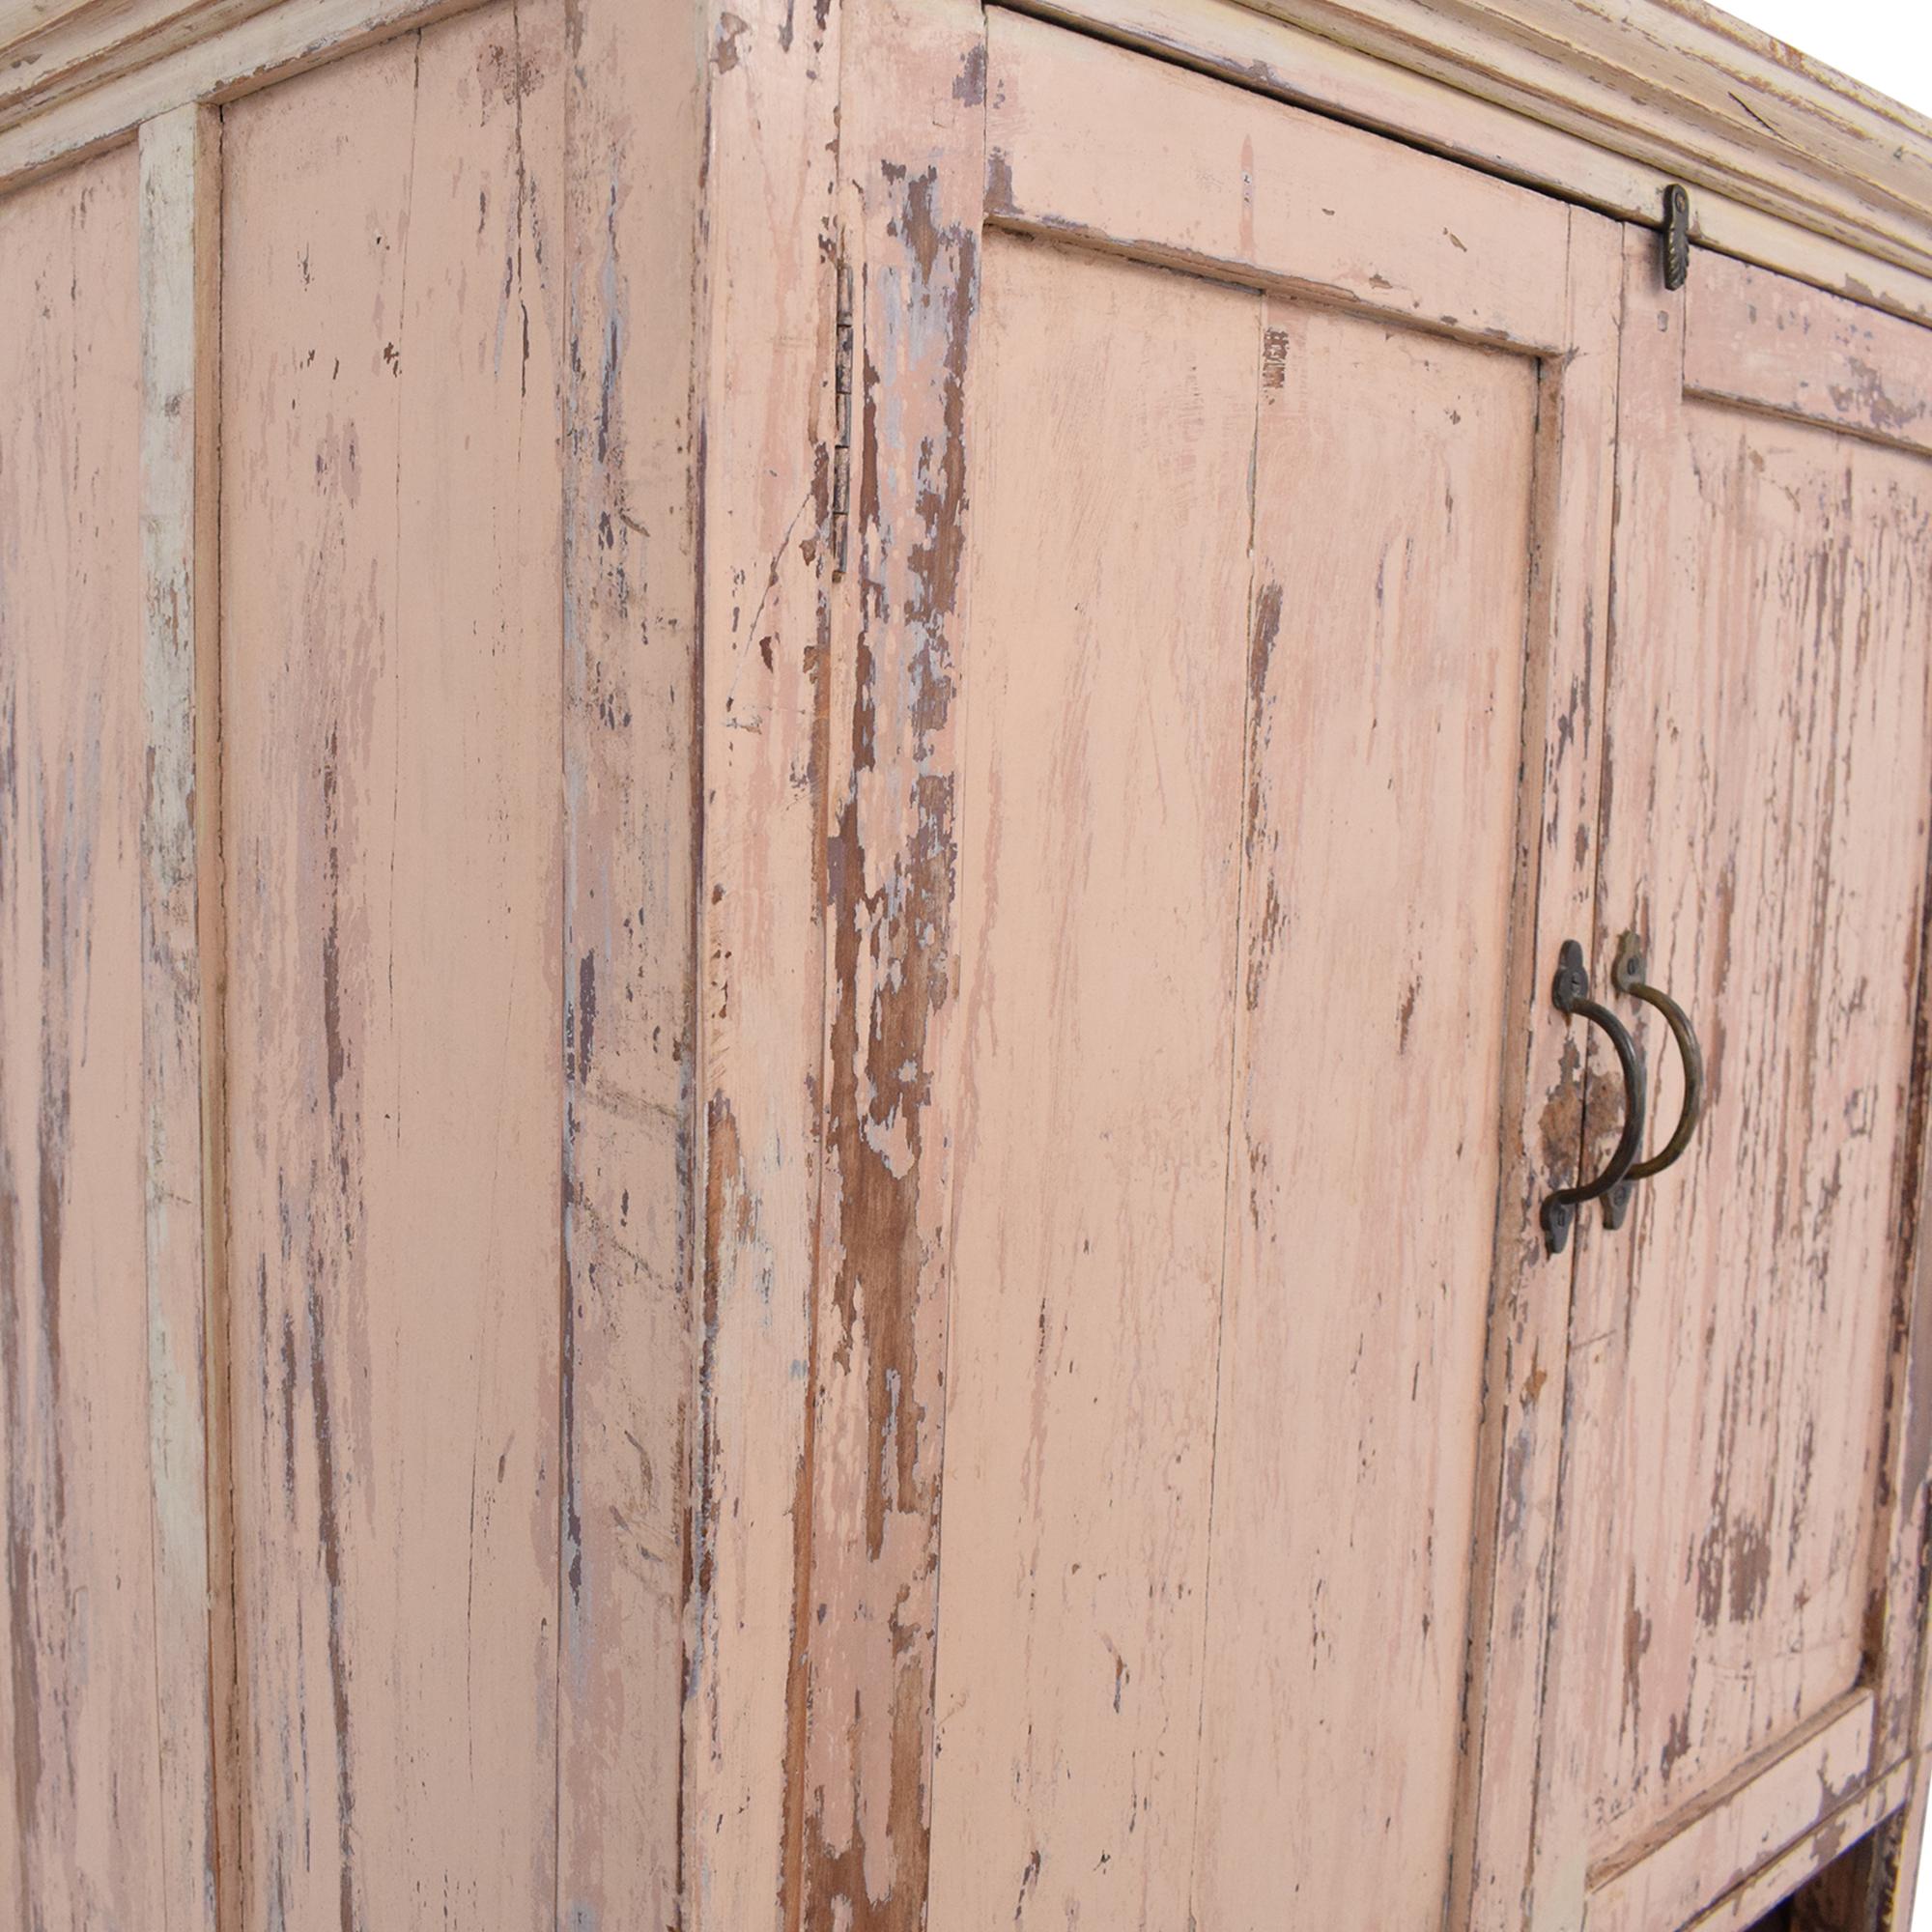 ABC Carpet & Home ABC Carpet & Home Storage Cabinet light pink